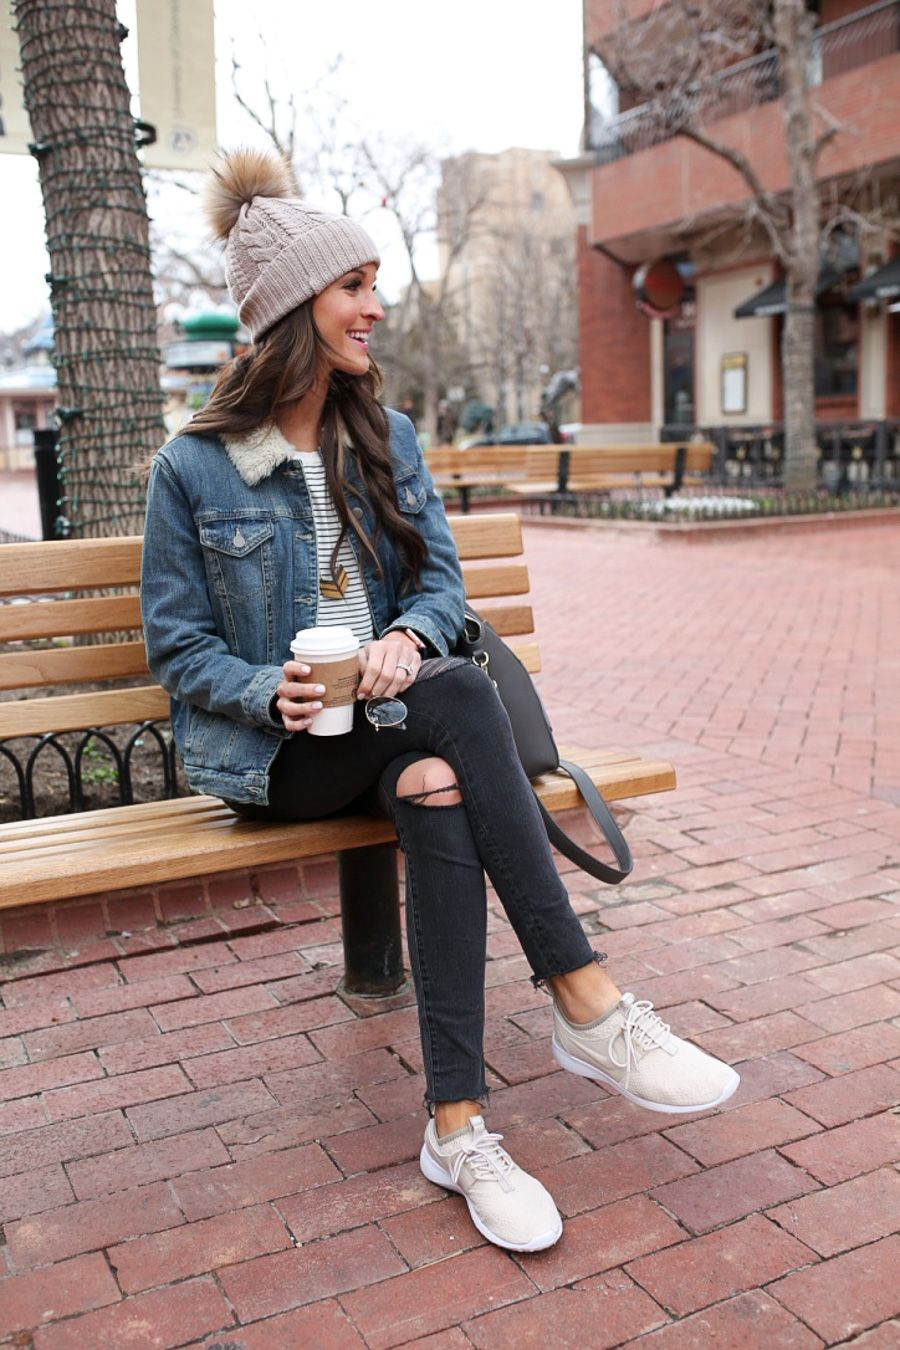 sneaker girl all day everyday  laurenkaysimscom  Winter